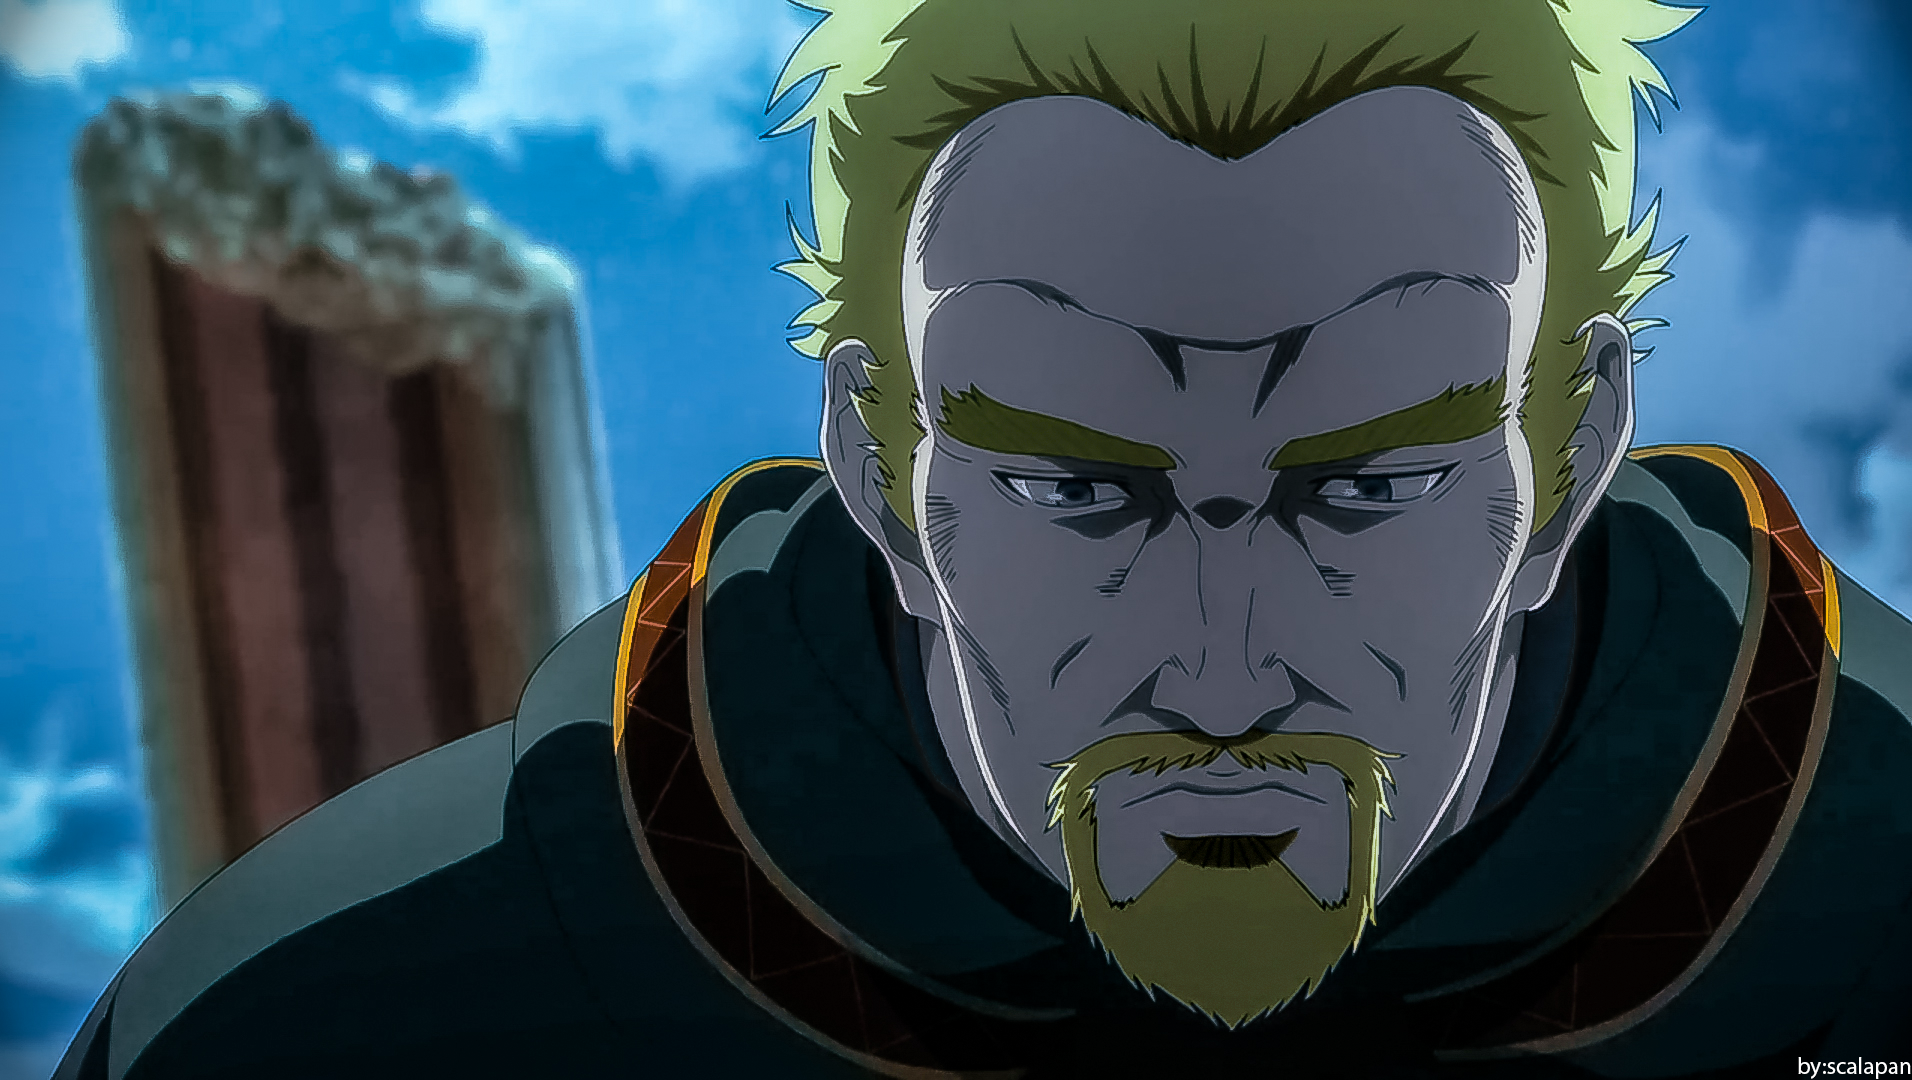 vinland saga askeladd anime manga Anime, Artes